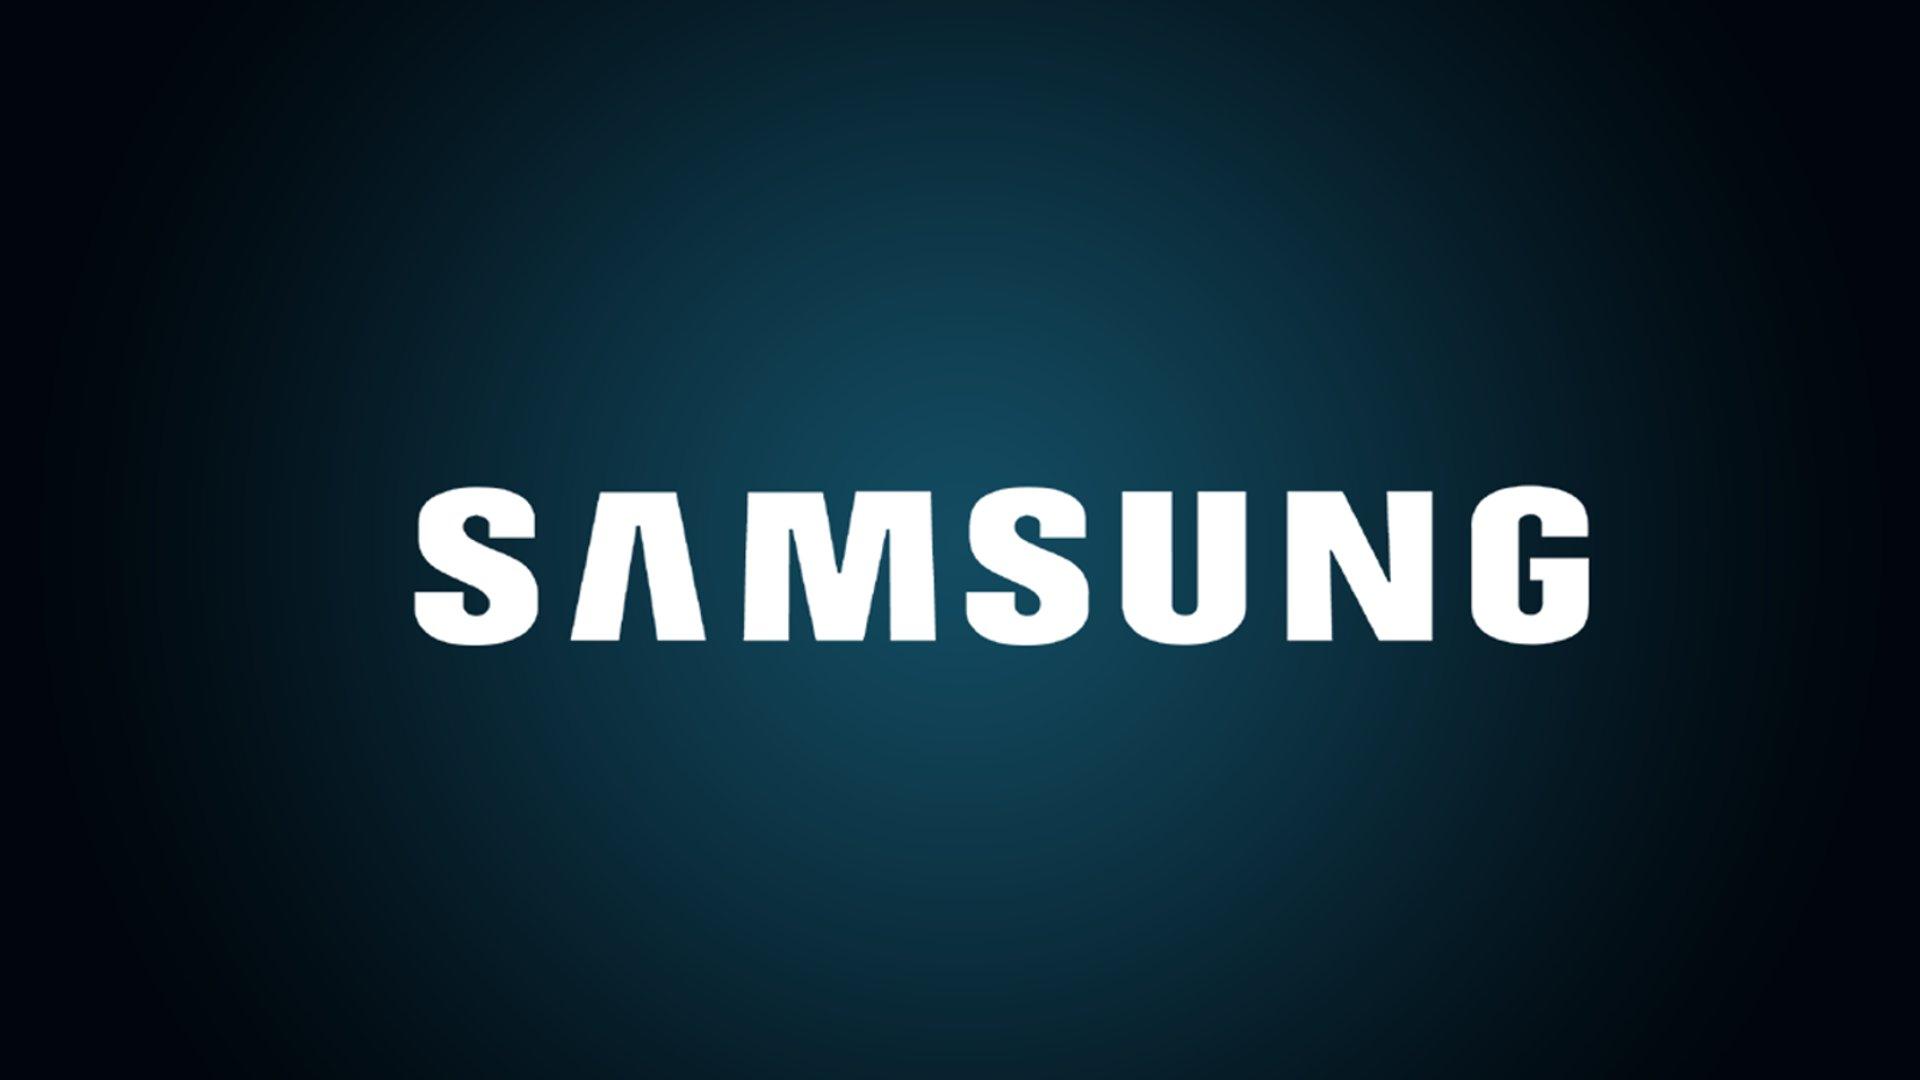 логотип самсунг фото имеет прекрасную